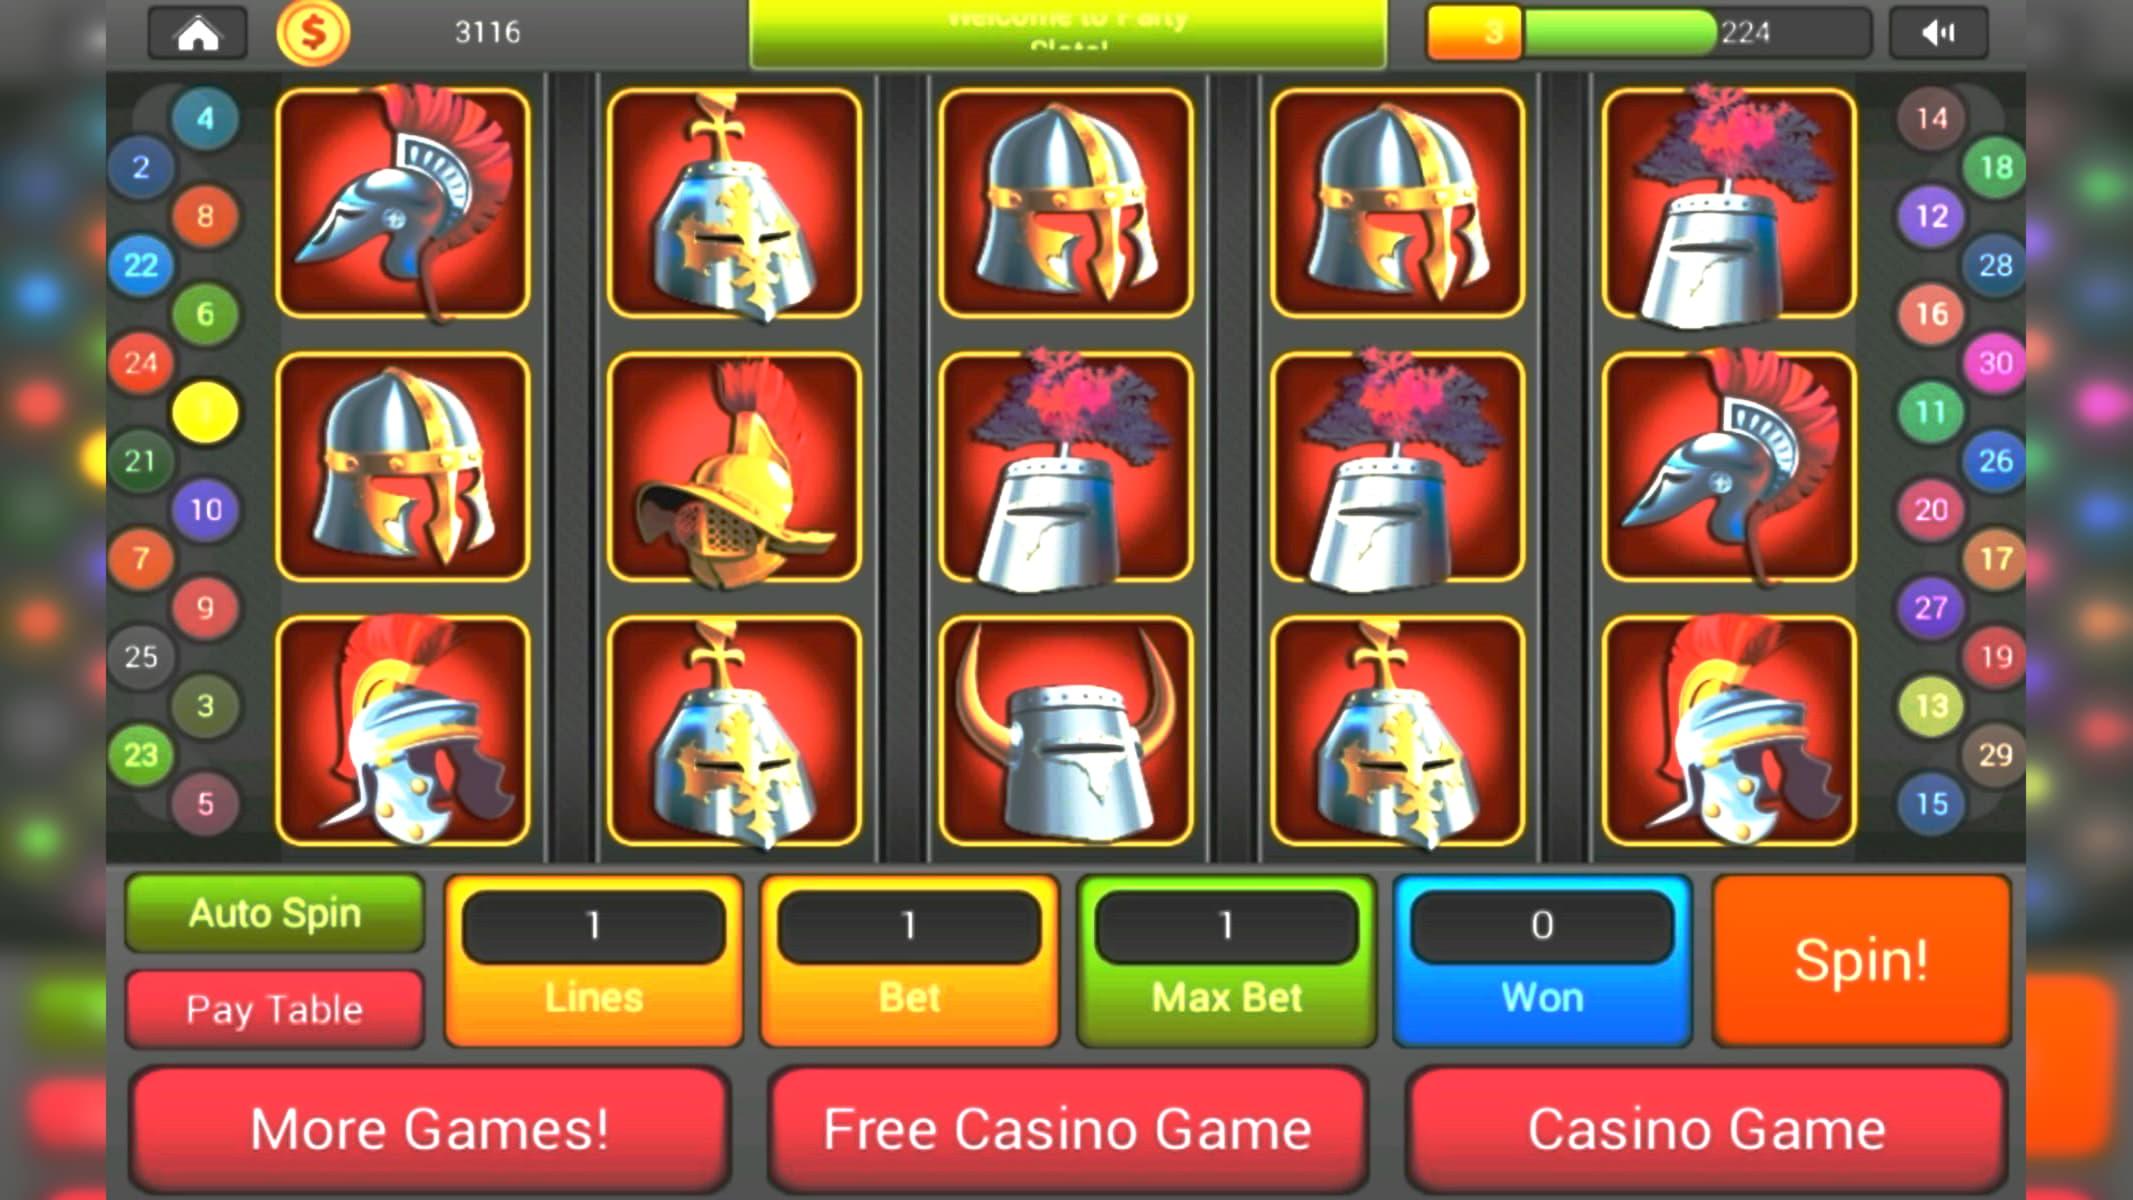 Lucky Spins Casino No Deposit Bonus Codes